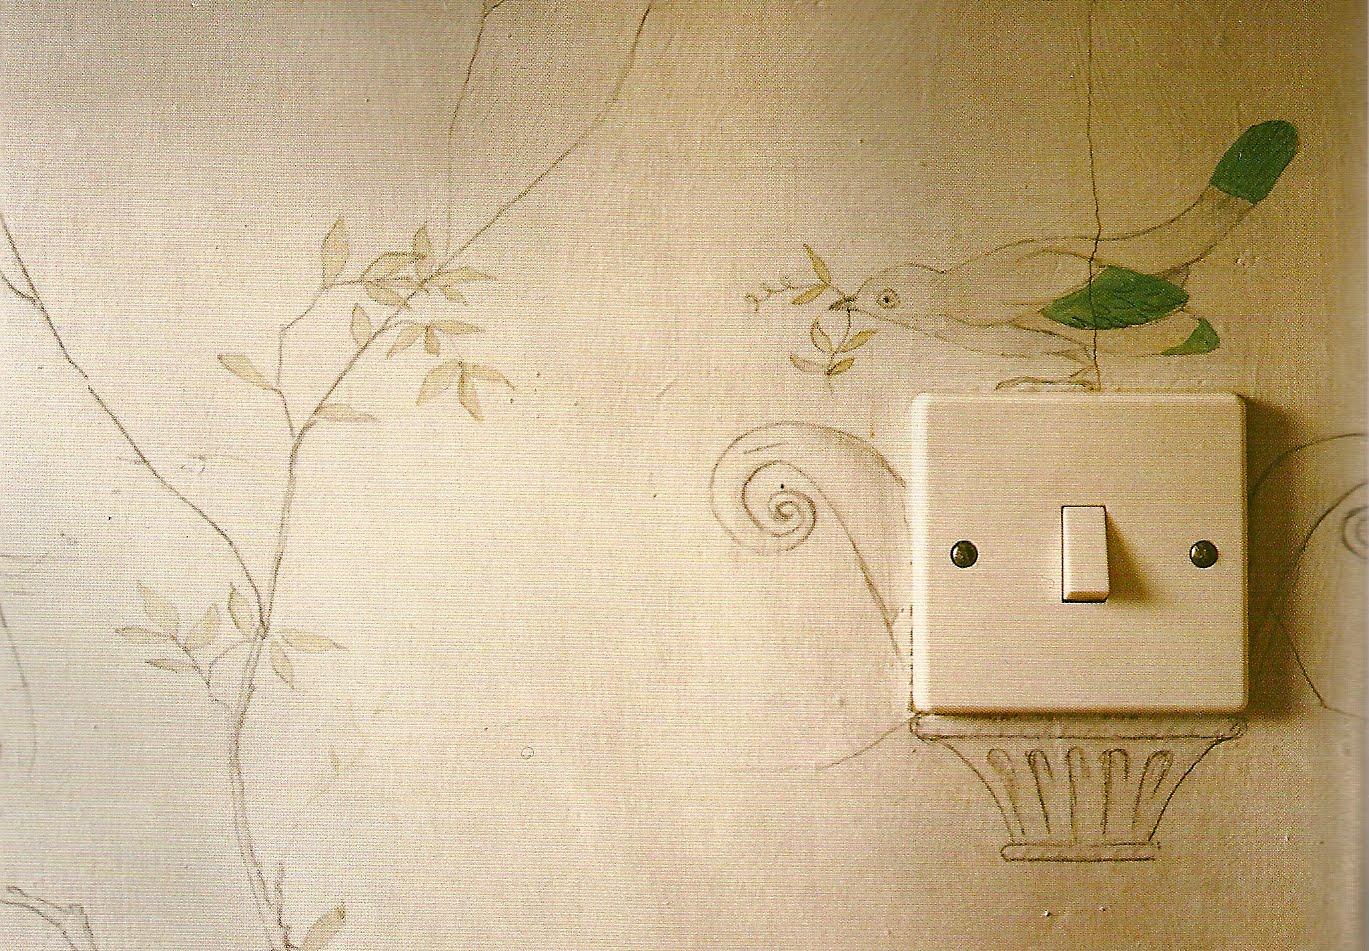 http://4.bp.blogspot.com/_UoWCF6CLKMc/S8bAy2Fwe7I/AAAAAAAABBo/RiYafP1II5M/s1600/Hand_drawn_chinoiserie_wallpaper.jpg